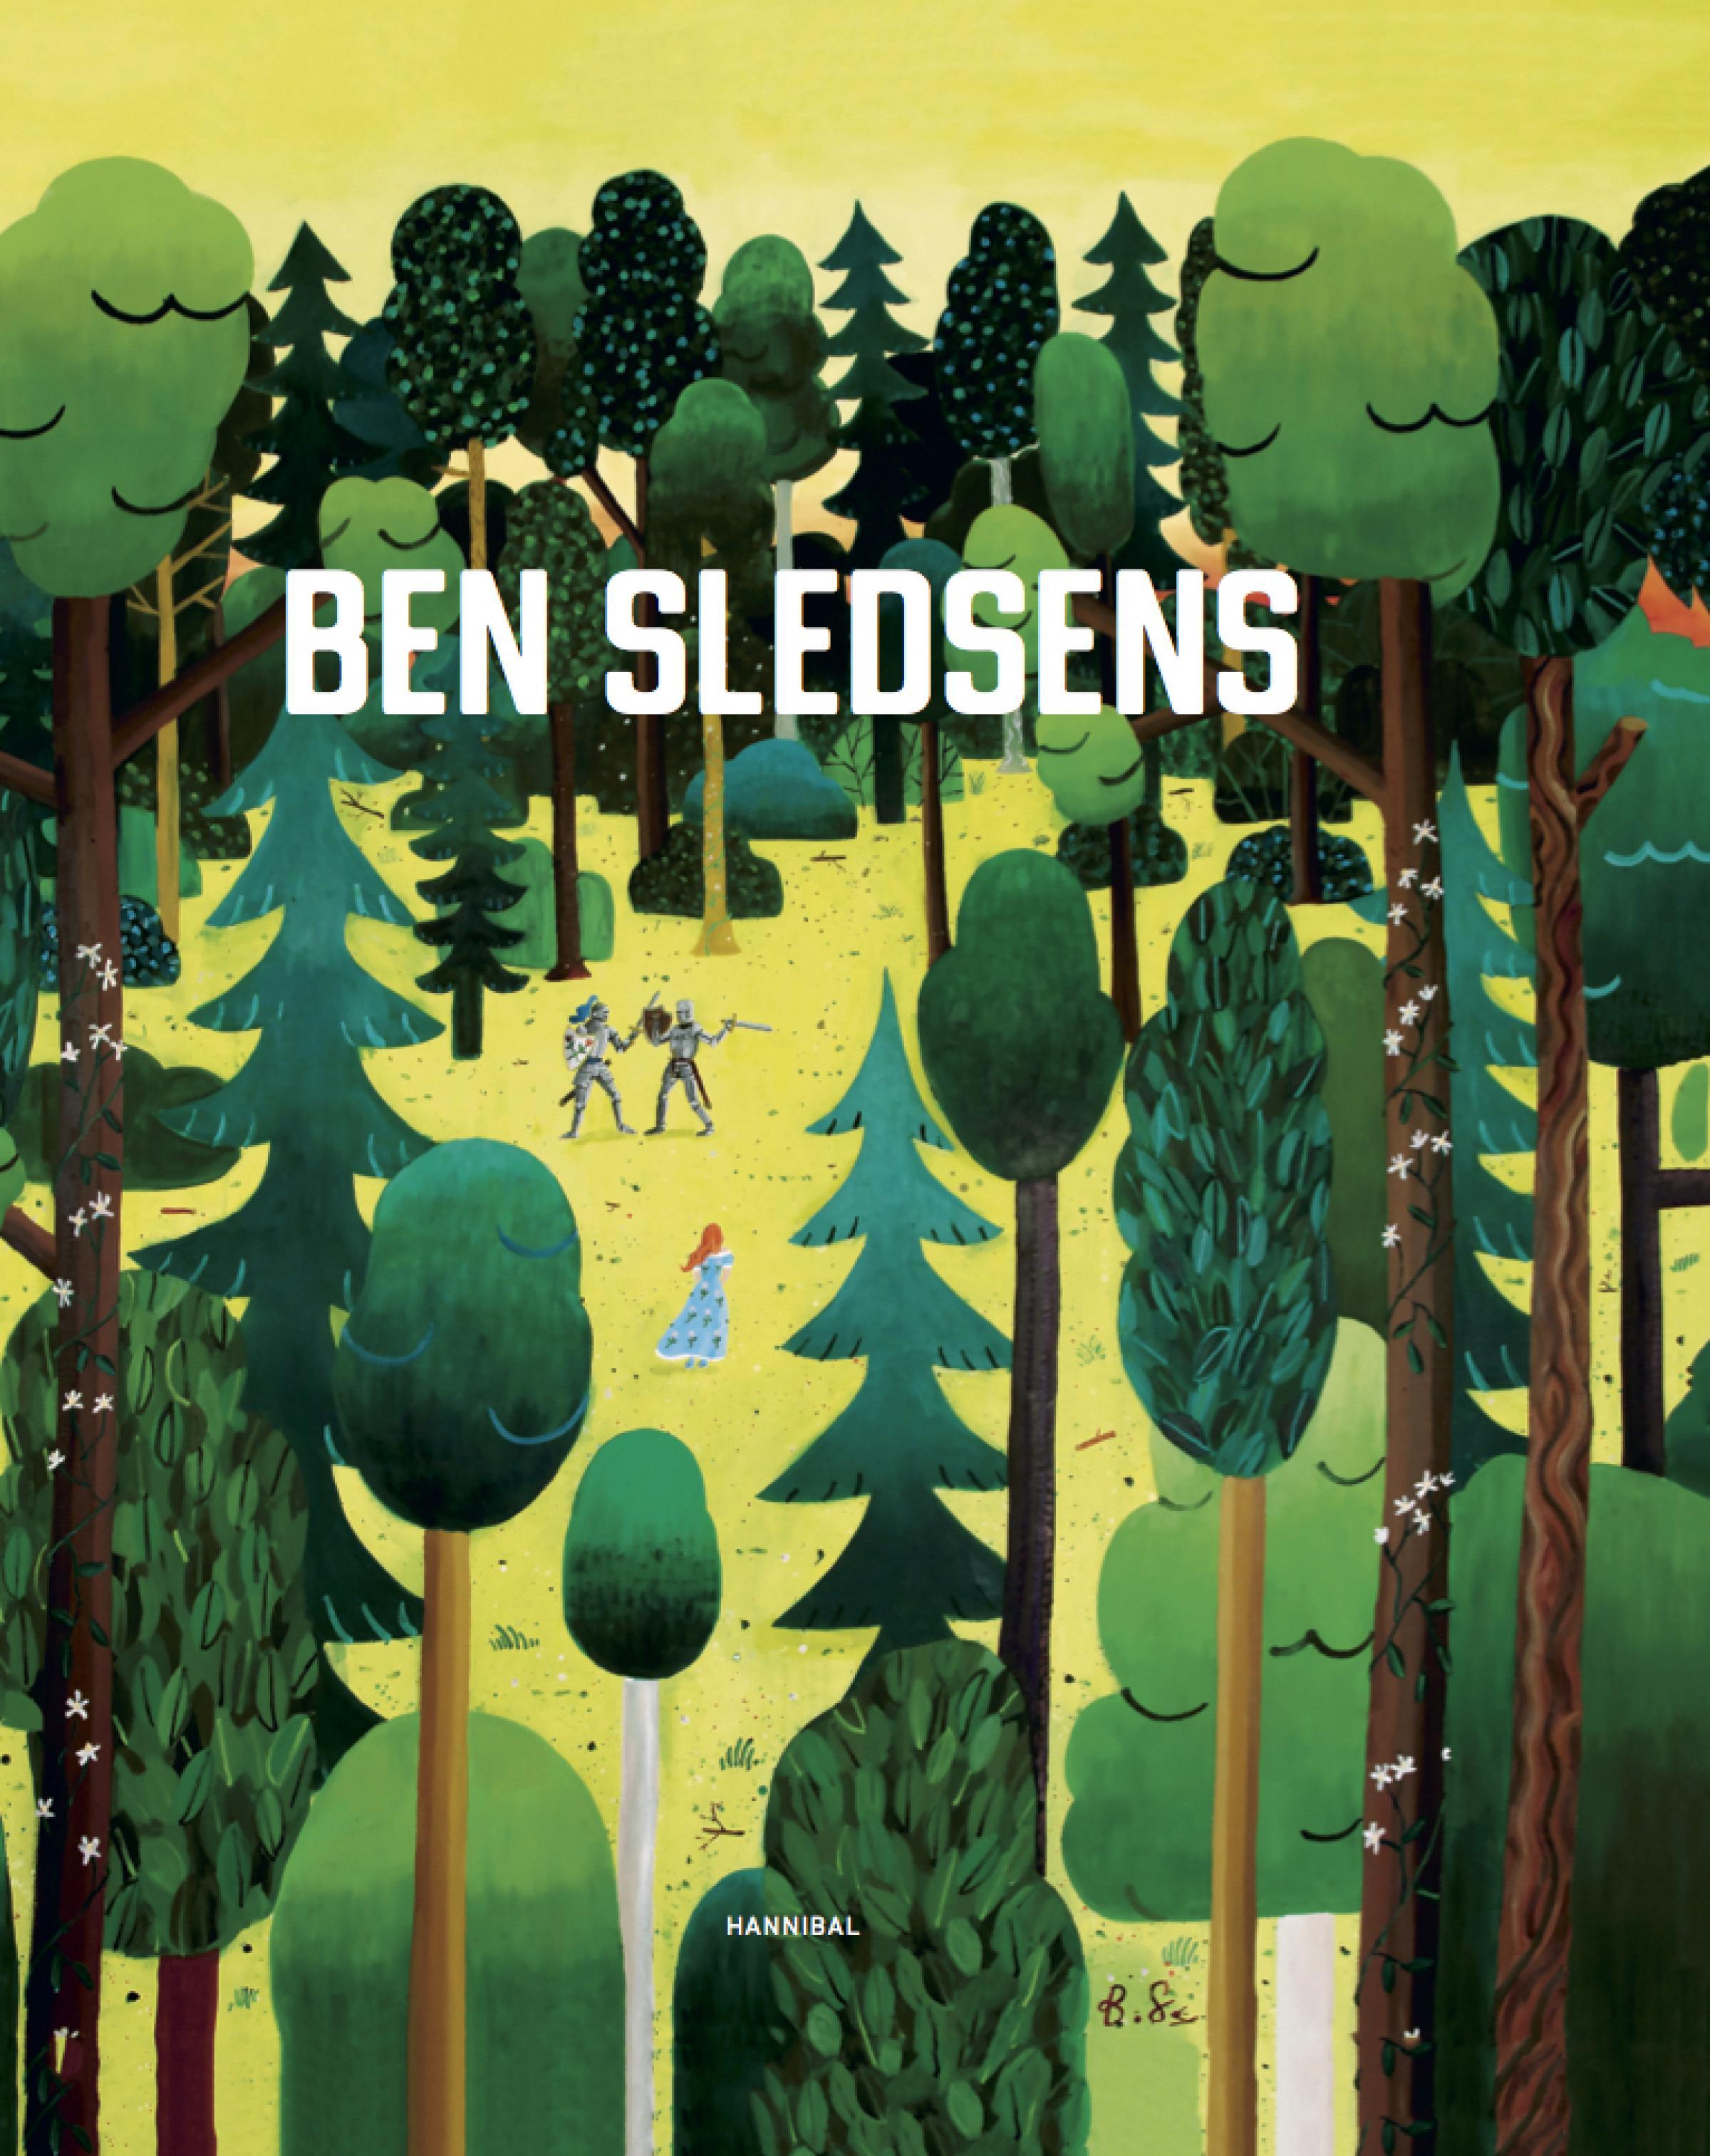 Ben Sledsens: Ben Sledsens